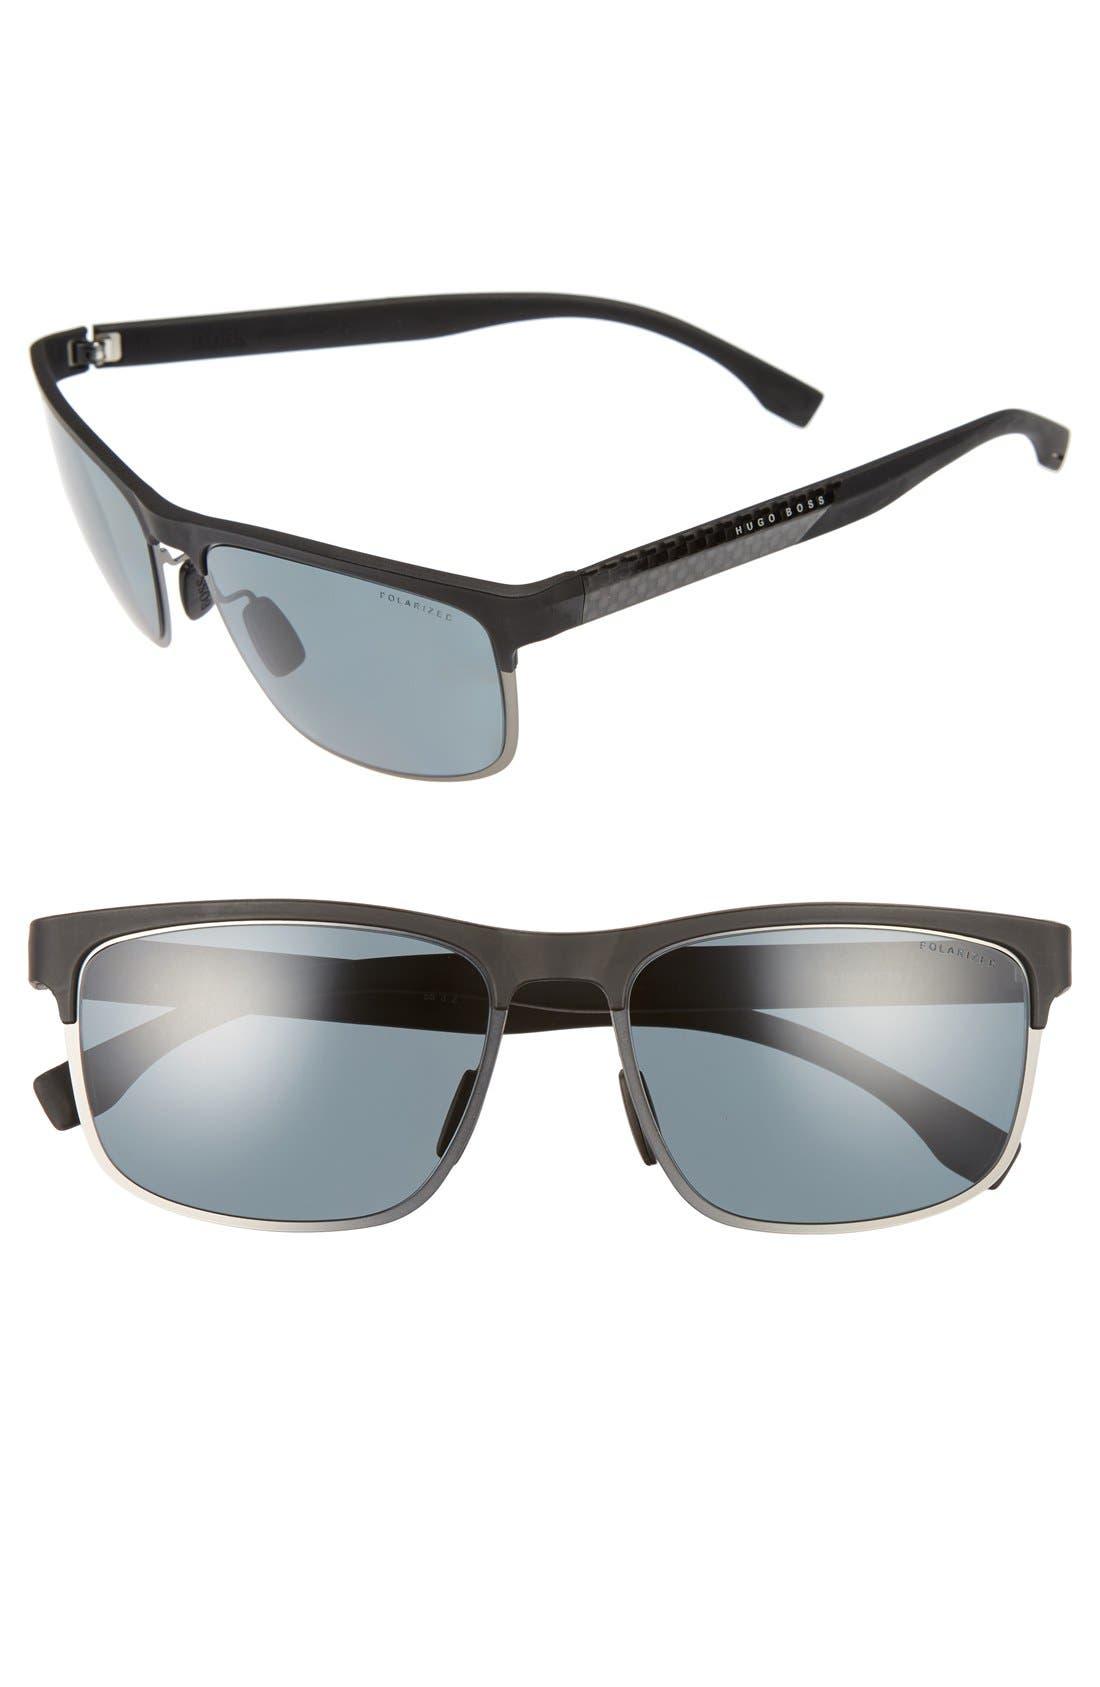 58mm Polarized Sunglasses,                             Main thumbnail 1, color,                             001